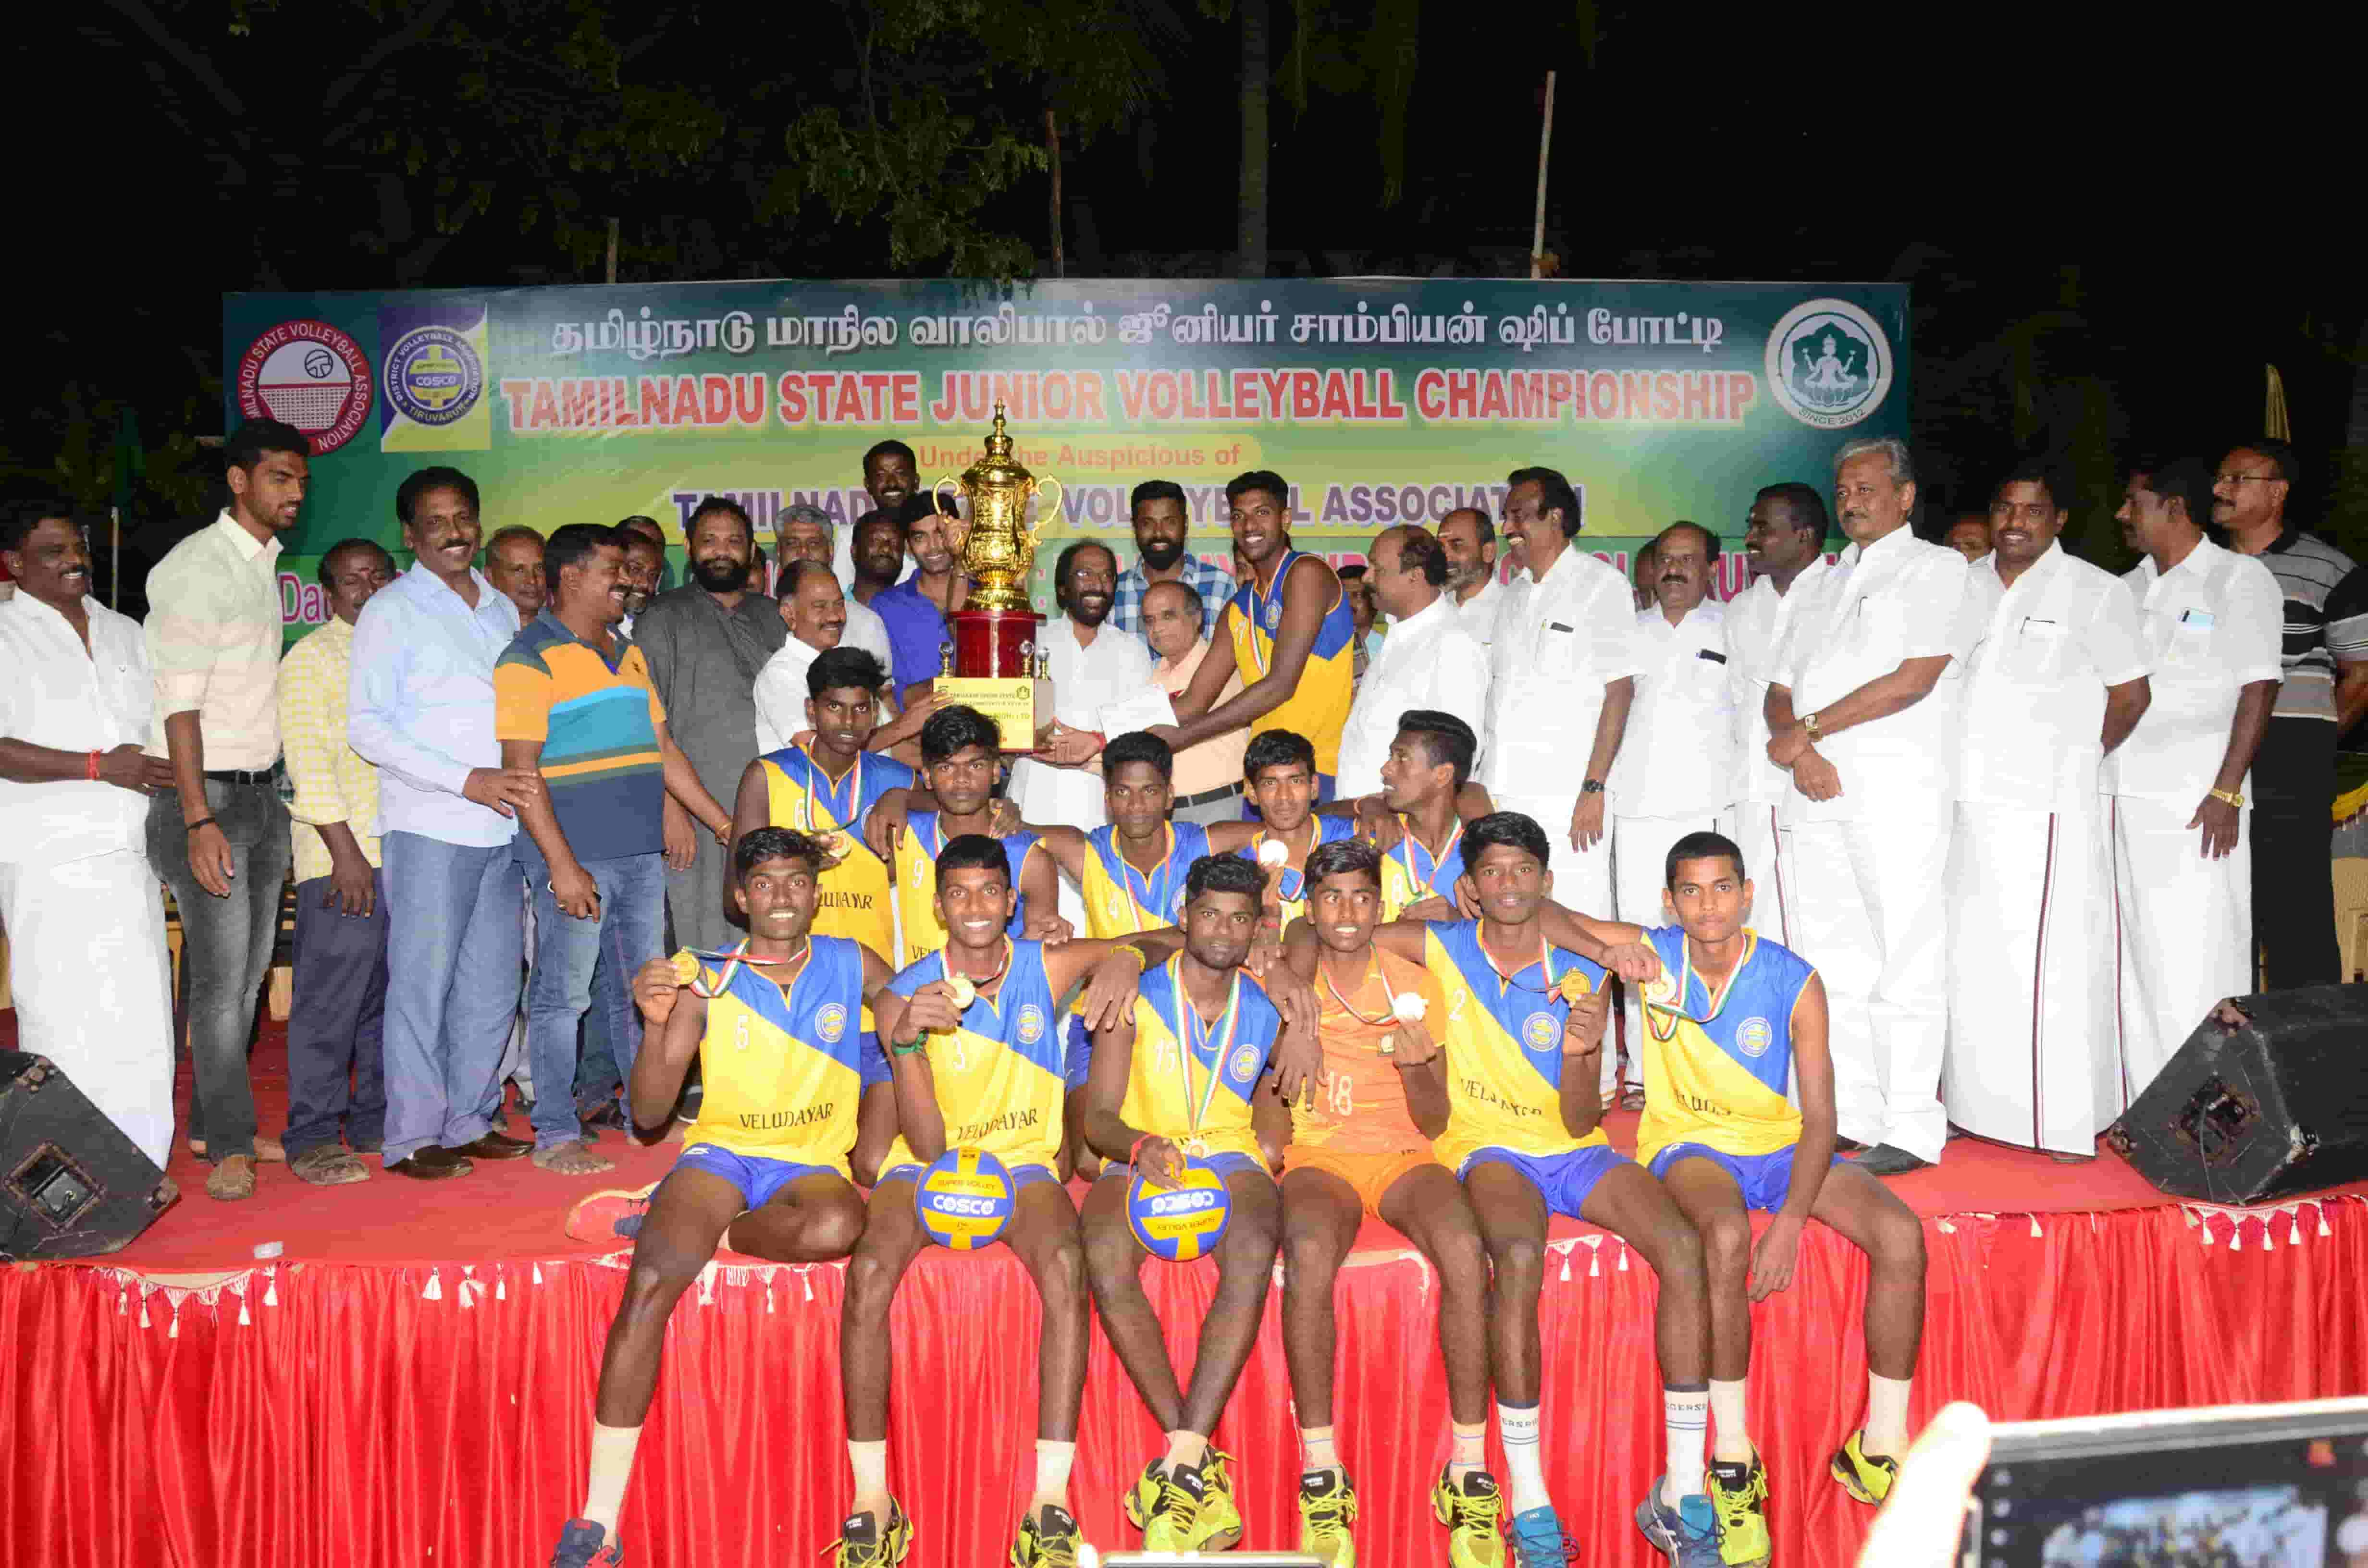 https://tnsva-live.s3.ap-south-1.amazonaws.com/1580735259/State_Junior_Championship_2020_Tiruvarur5.JPG